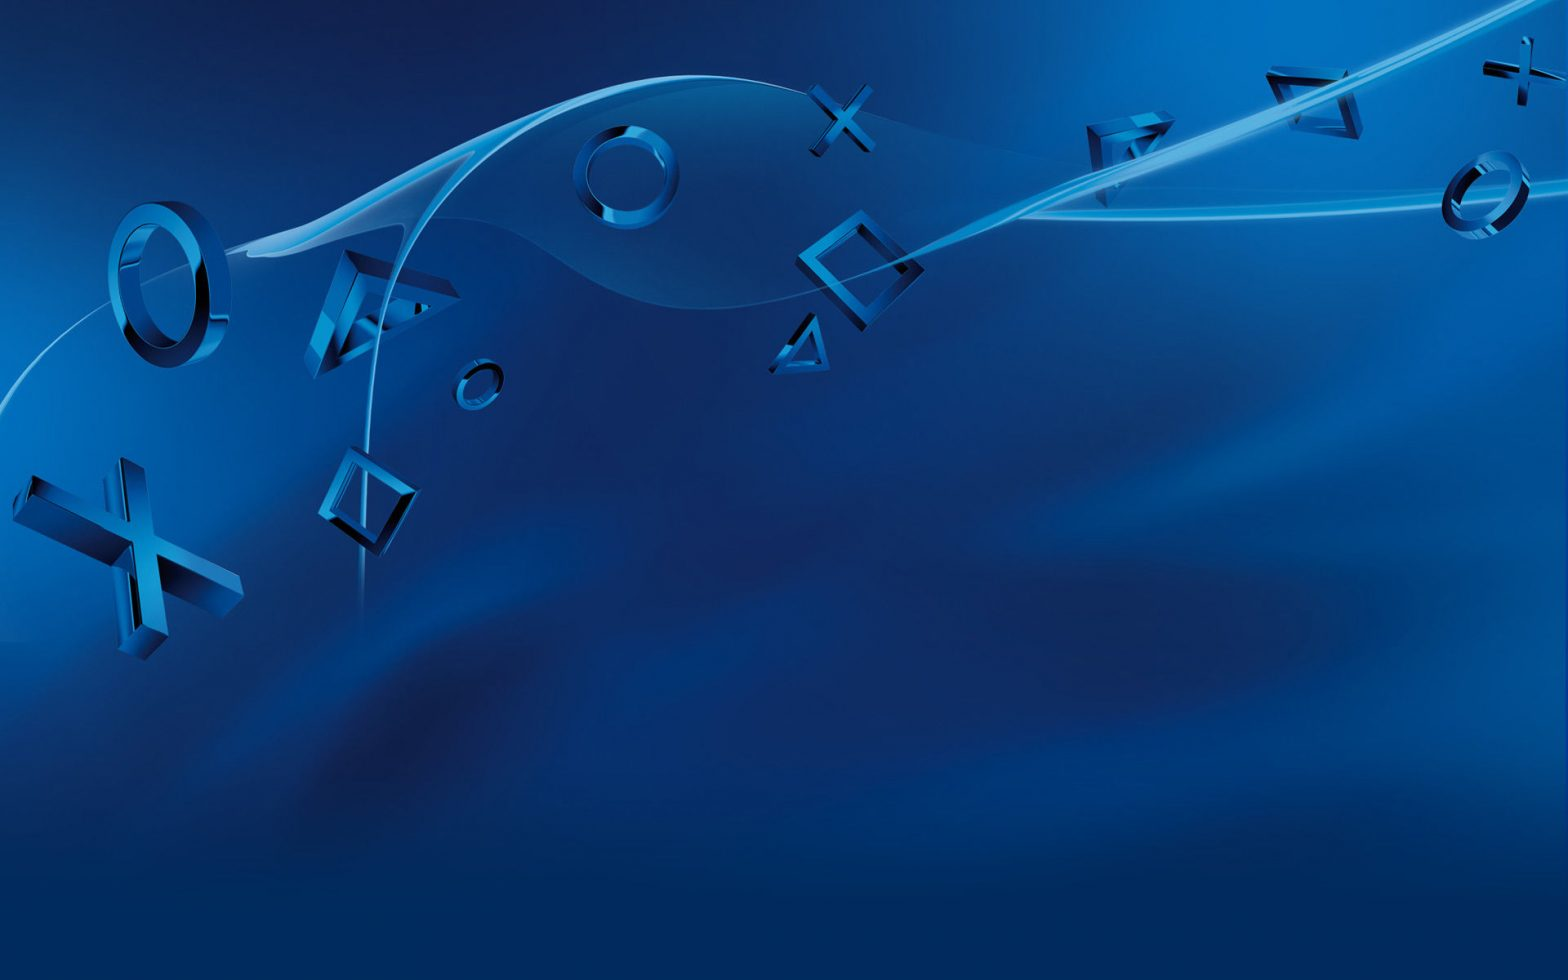 PlayStation 4 BG